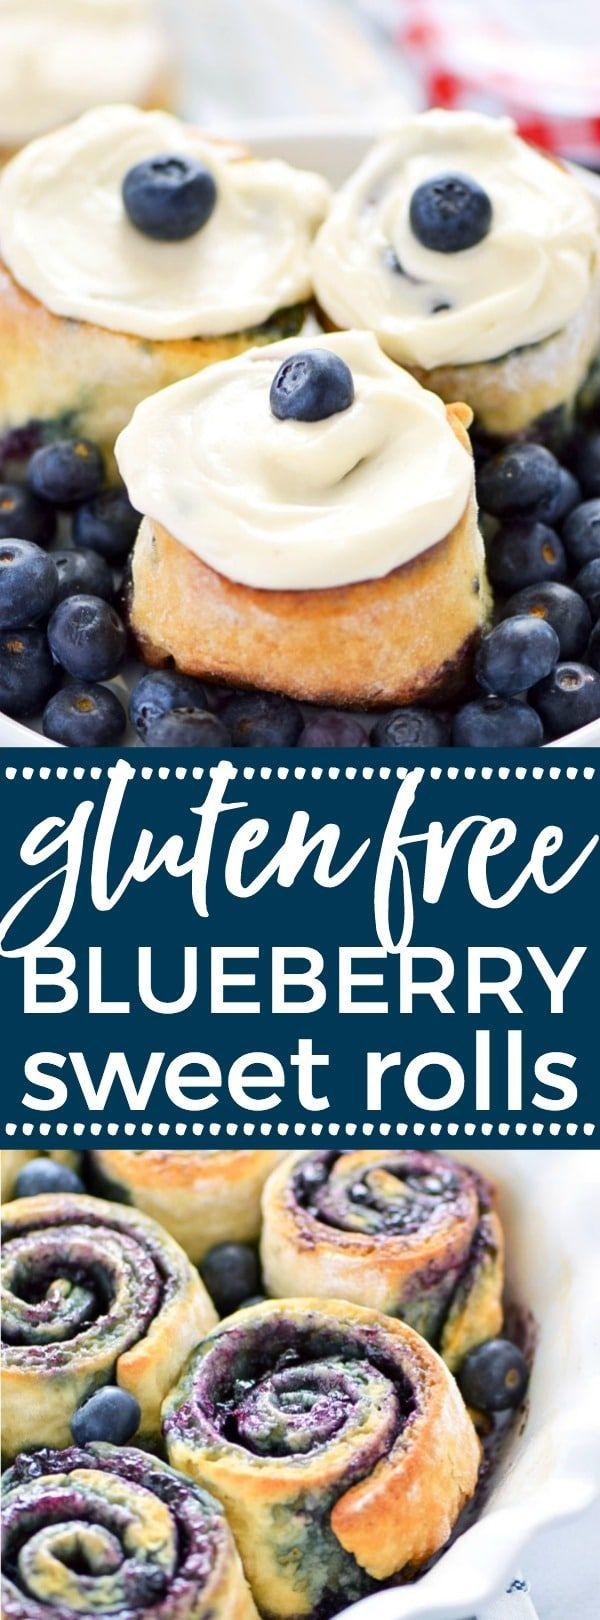 1-Hour Gluten Free Blueberry Sweet Rolls - perfect for brunch! Recipe from @whattheforkblog | whattheforkfoodblog.com | gluten free baking | easy gluten free recipes | gluten free bread recipes | yeast rolls | brunch recipes